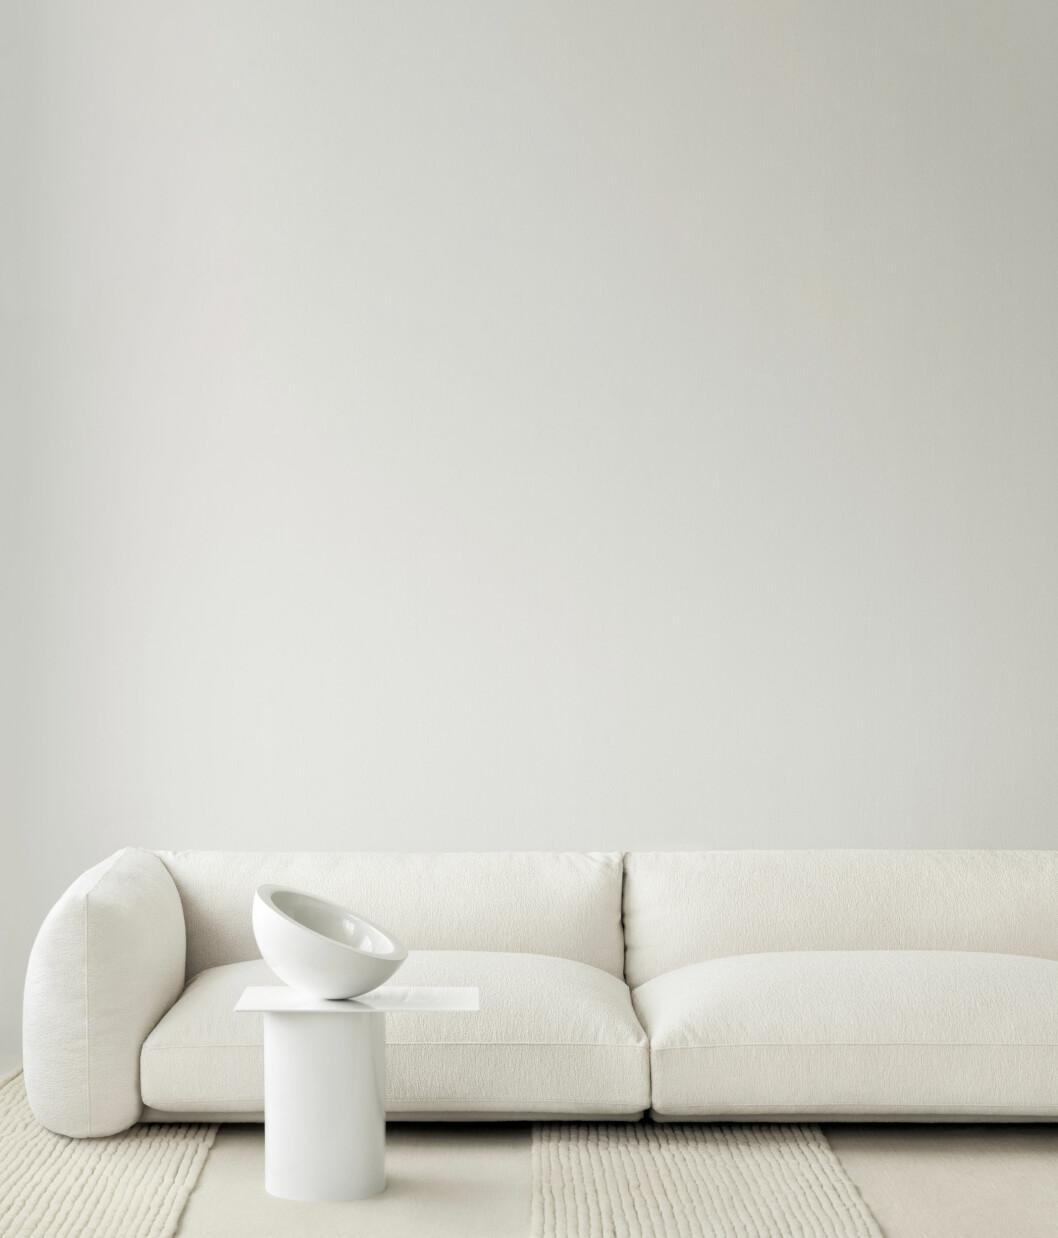 Mattan Striped Bone White från Layered och soffan LA Sofa 01.